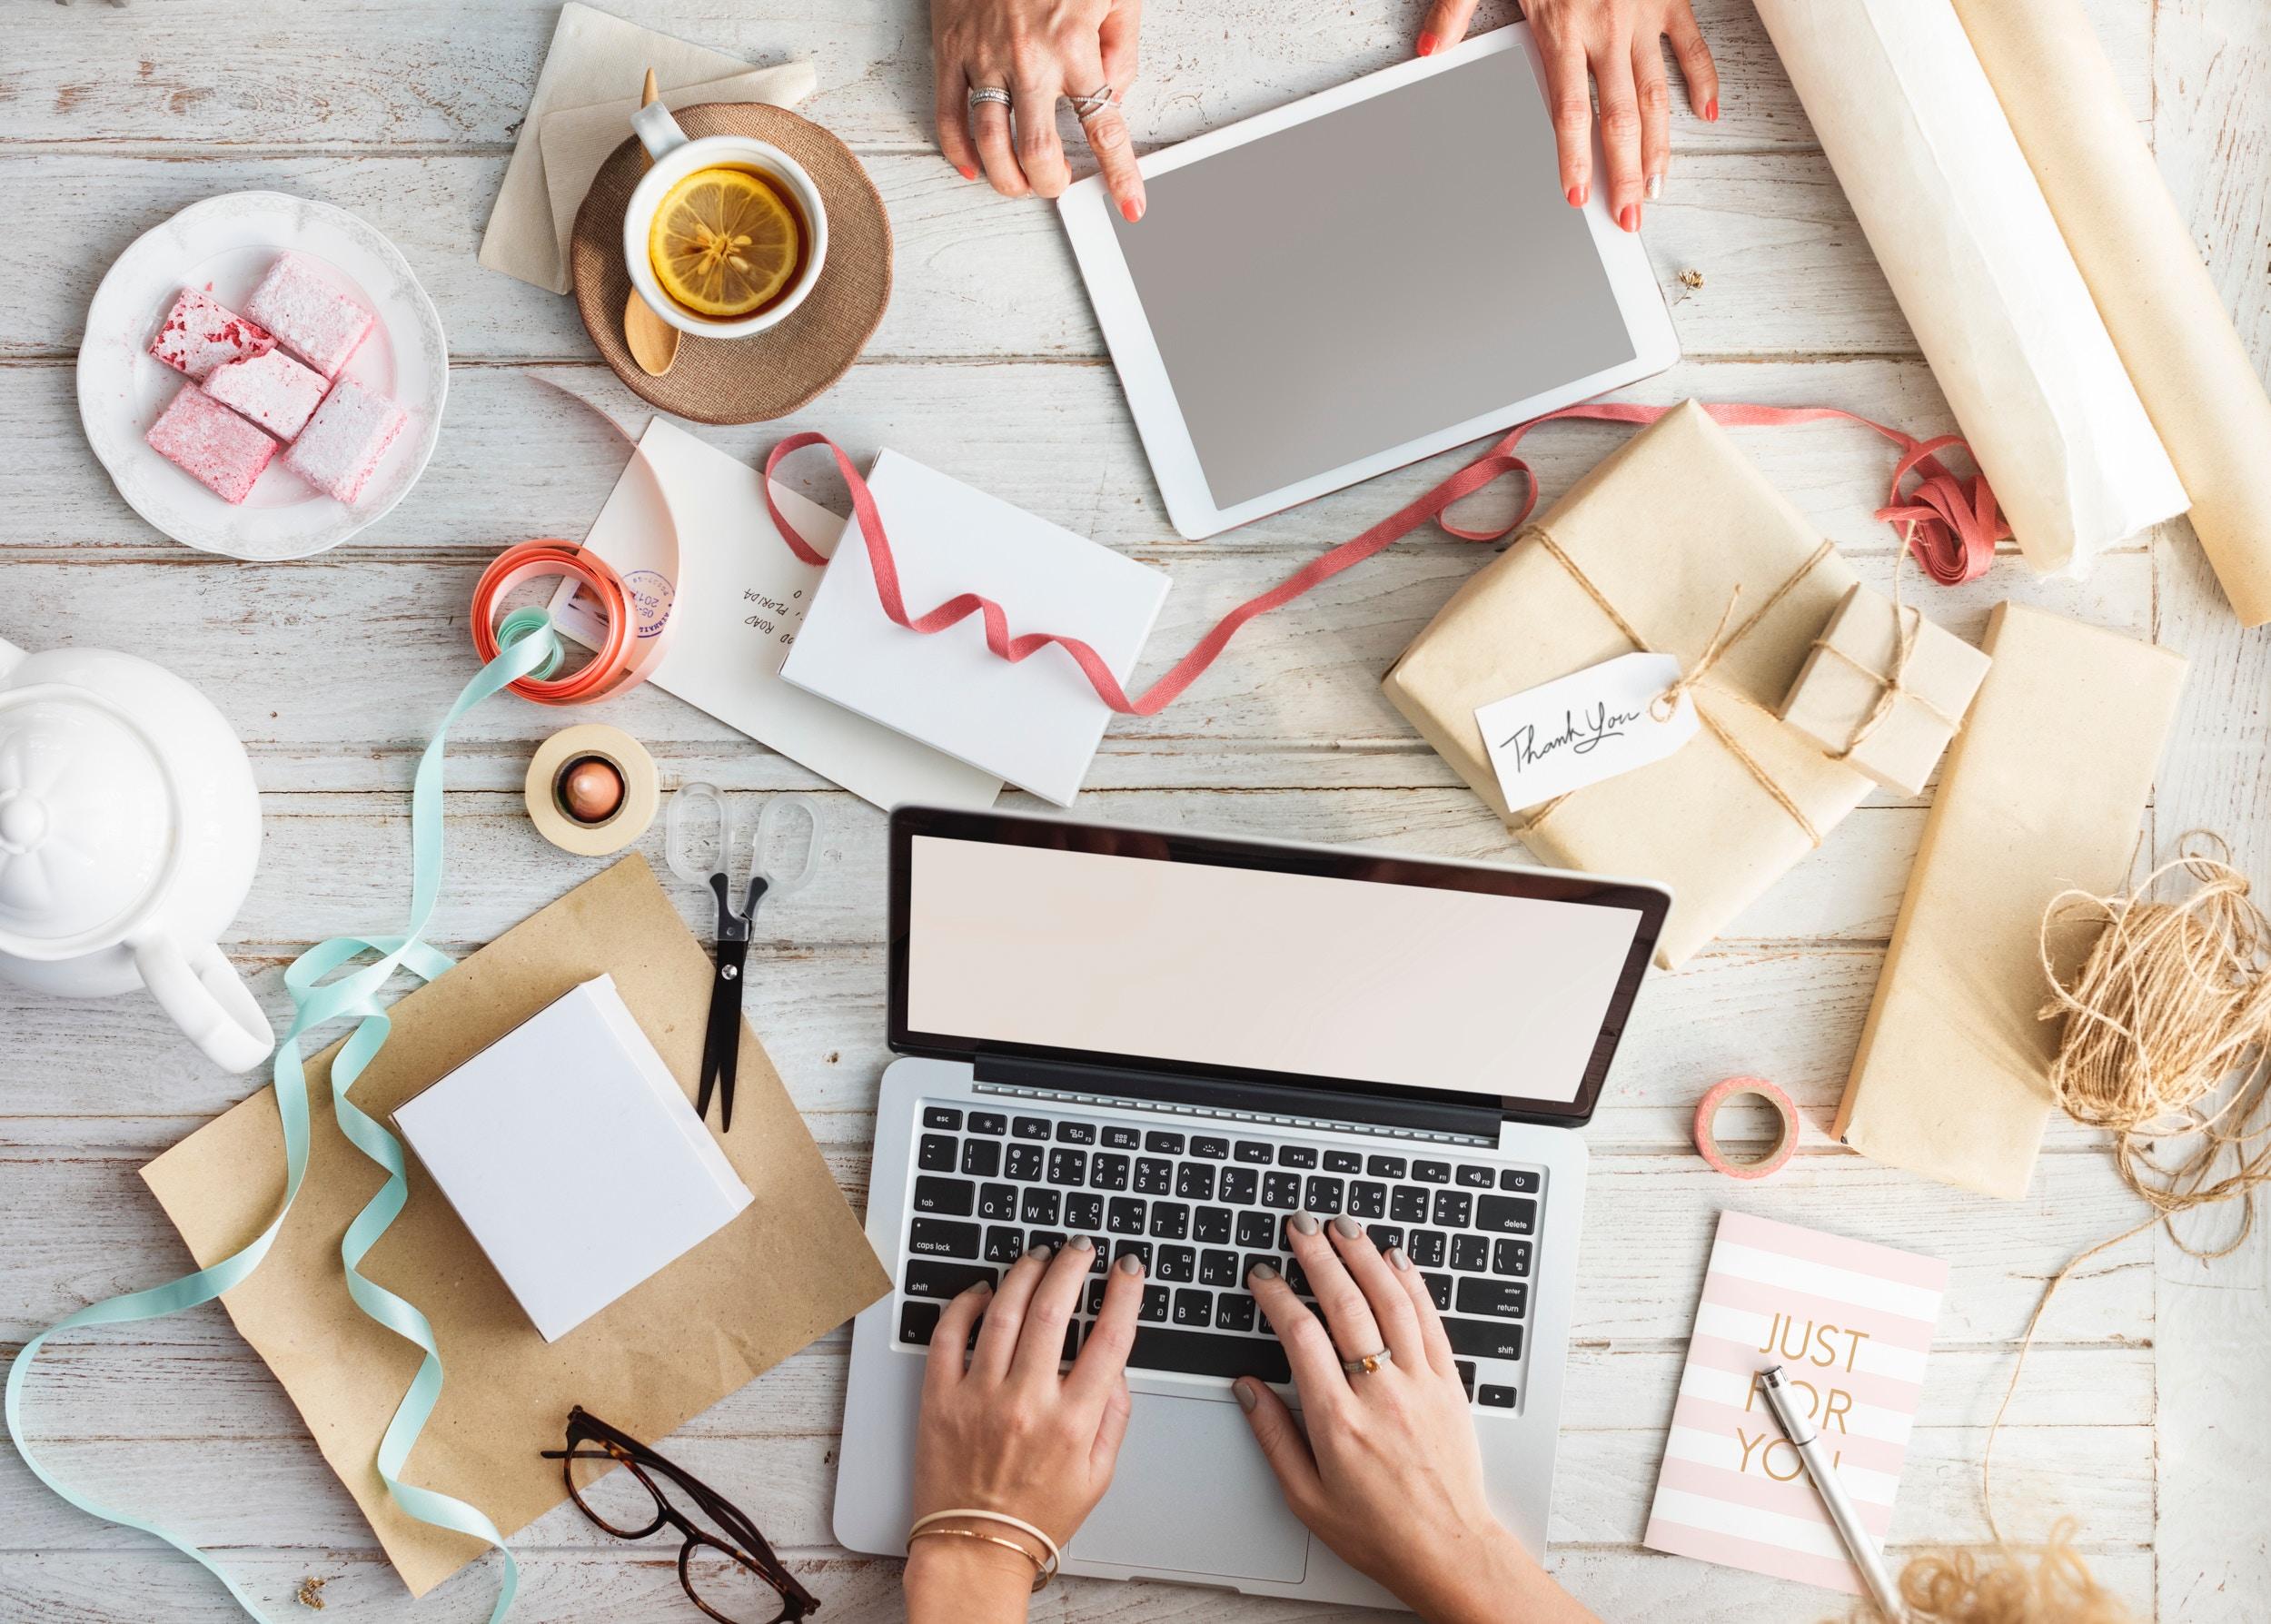 5 Best Practices for Designing Event Merchandise